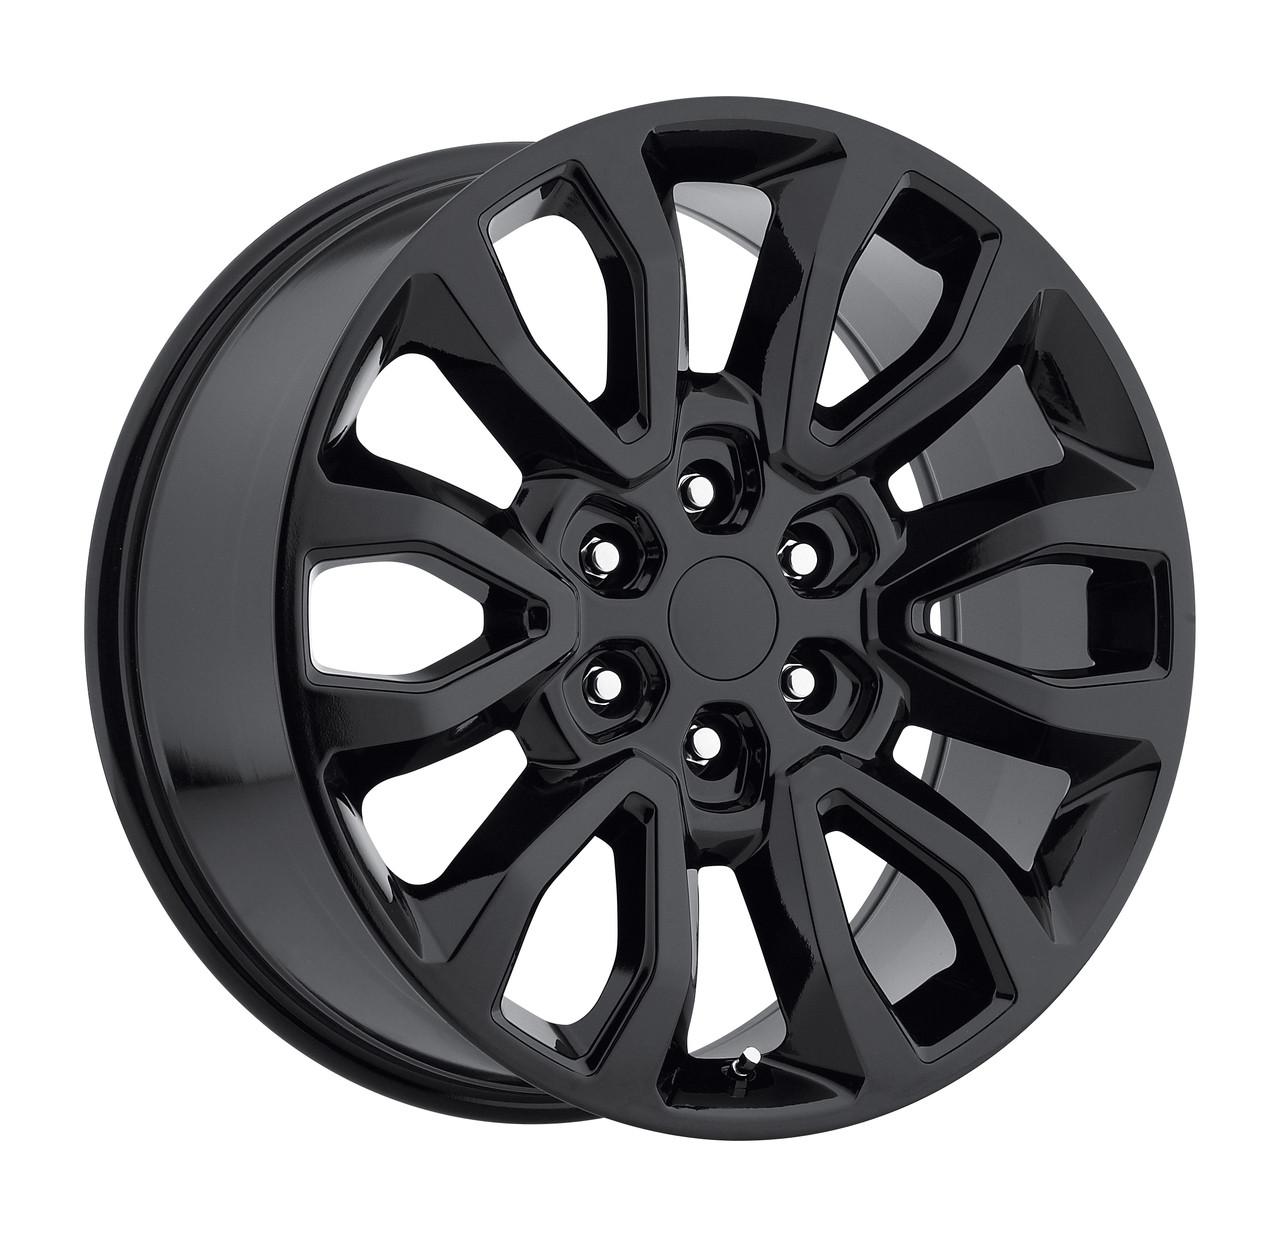 20 fits ford f150 6 lug wheels gloss black raptor style set of 4